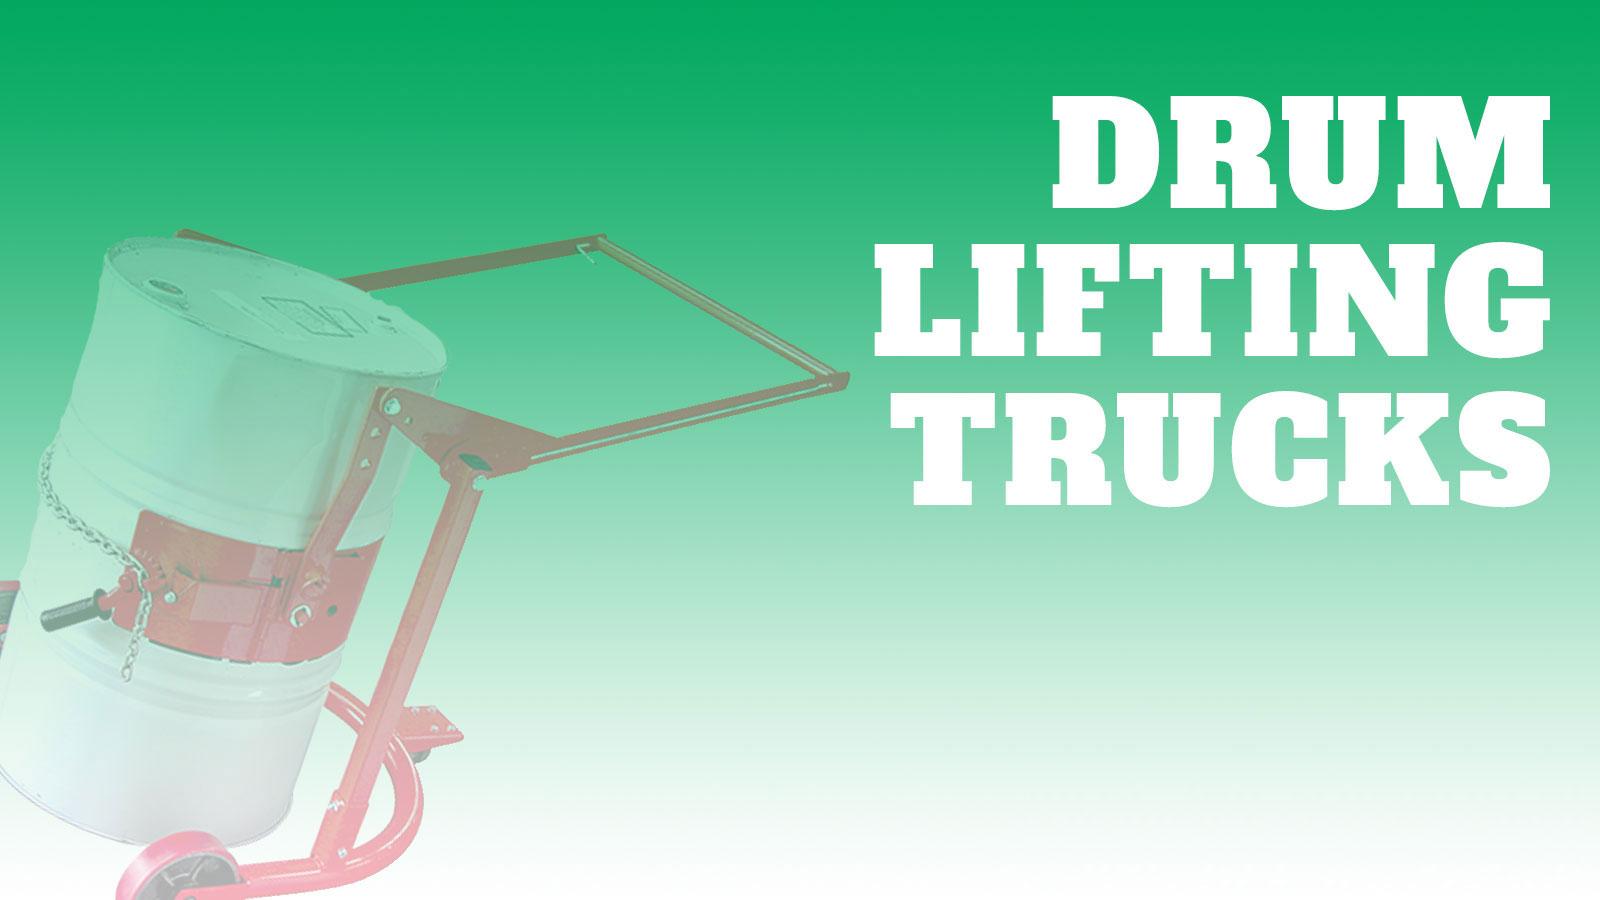 DrumHandling-Lifting